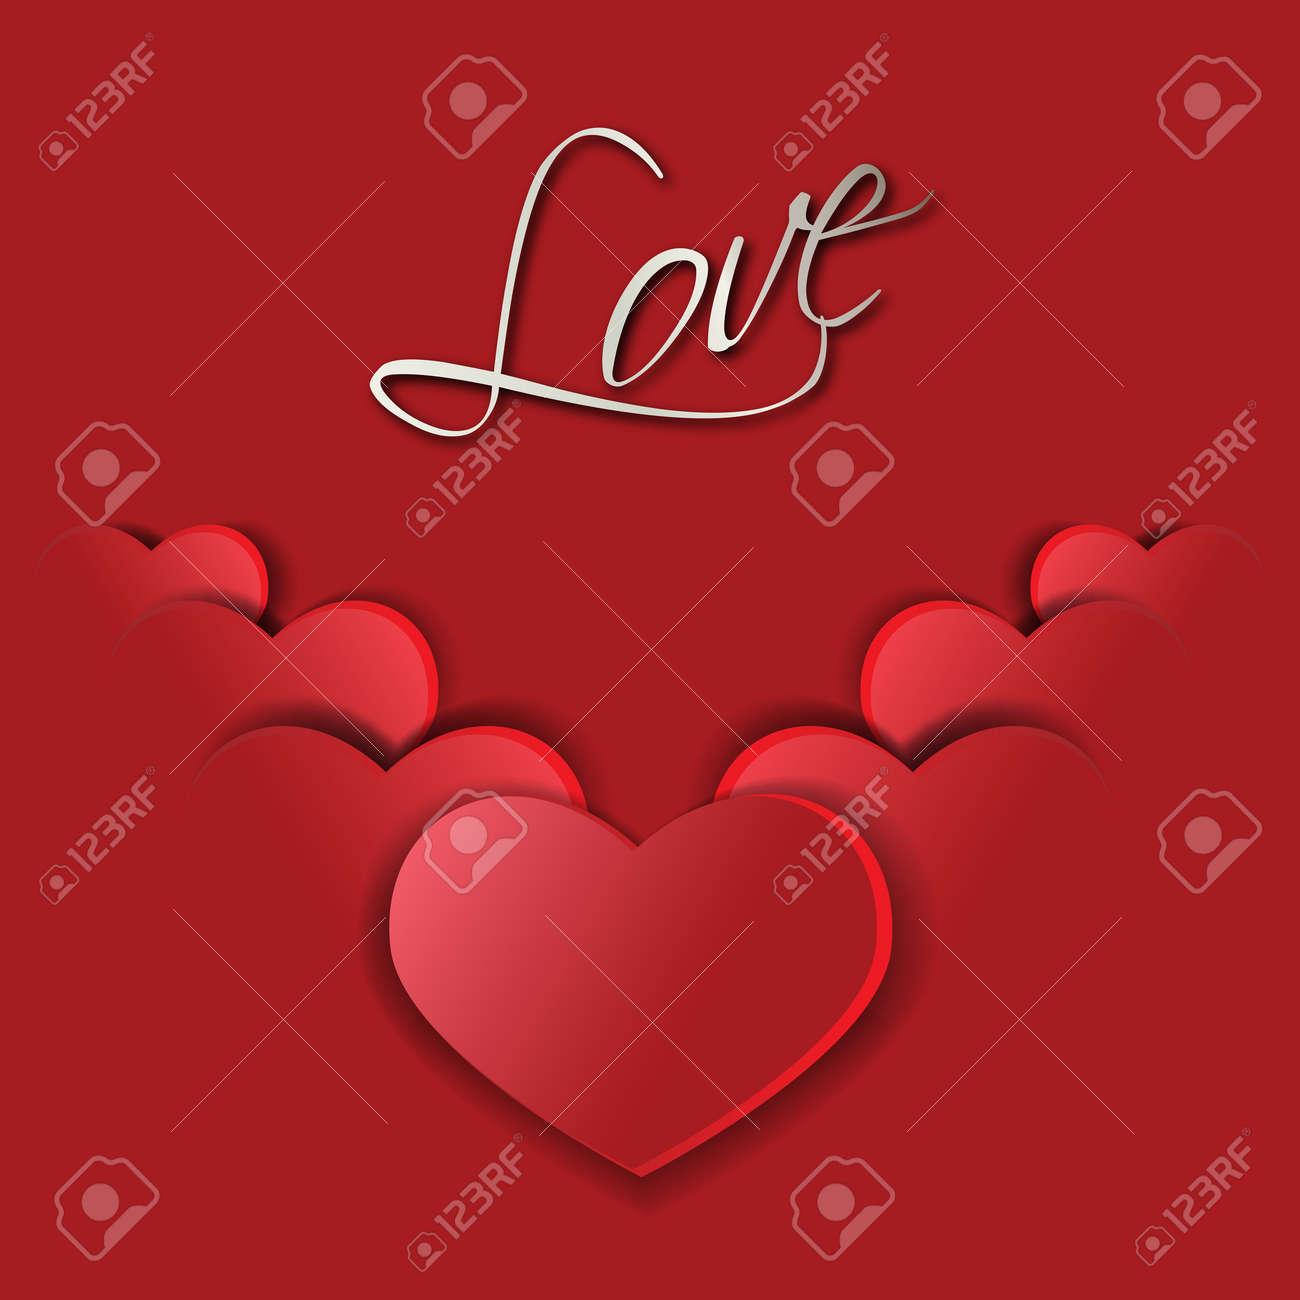 Big red hearts symbols of st valentine royalty free cliparts big red hearts symbols of st valentine stock vector 35378406 biocorpaavc